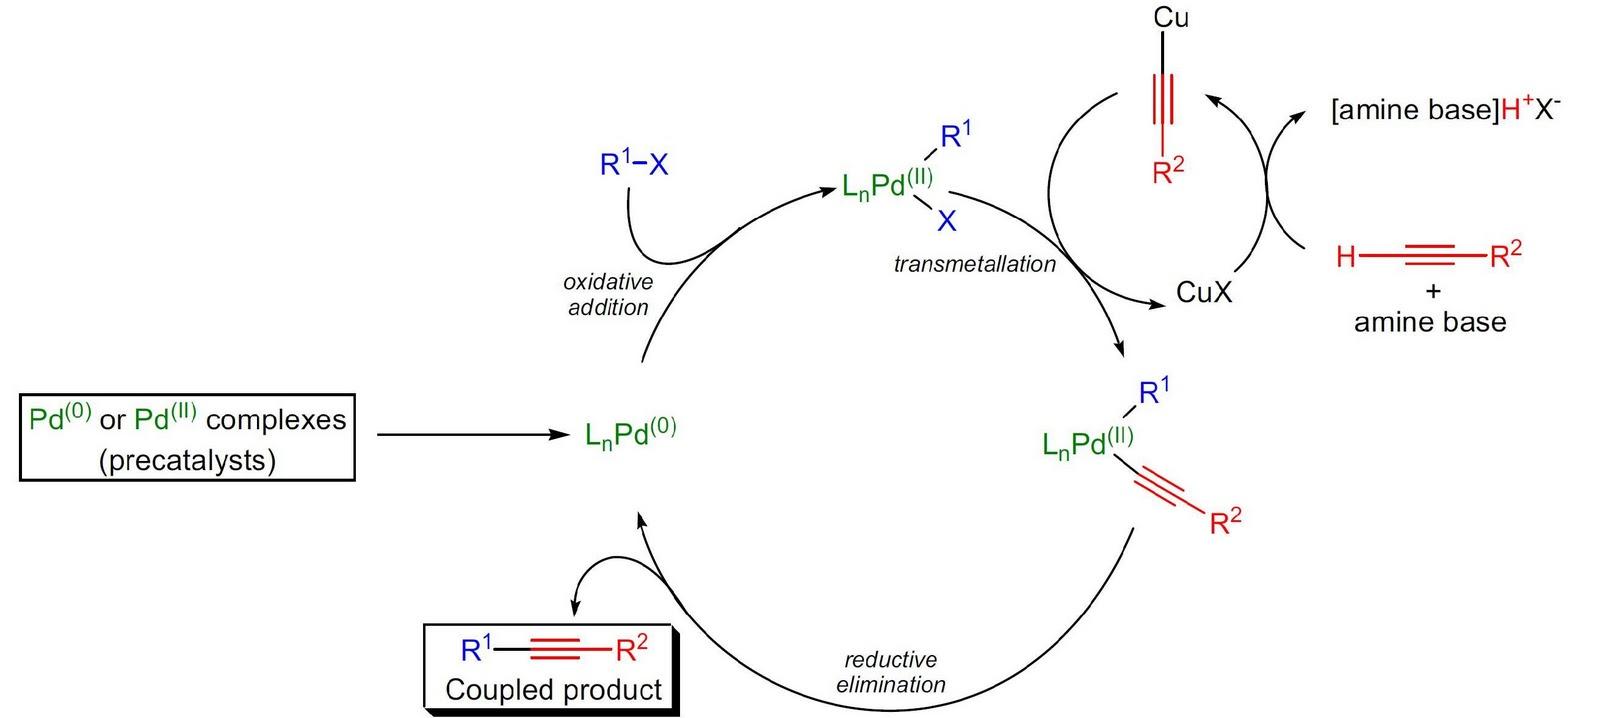 Raji Chem World Palladium Catalyzed Cross Coupling Reactions